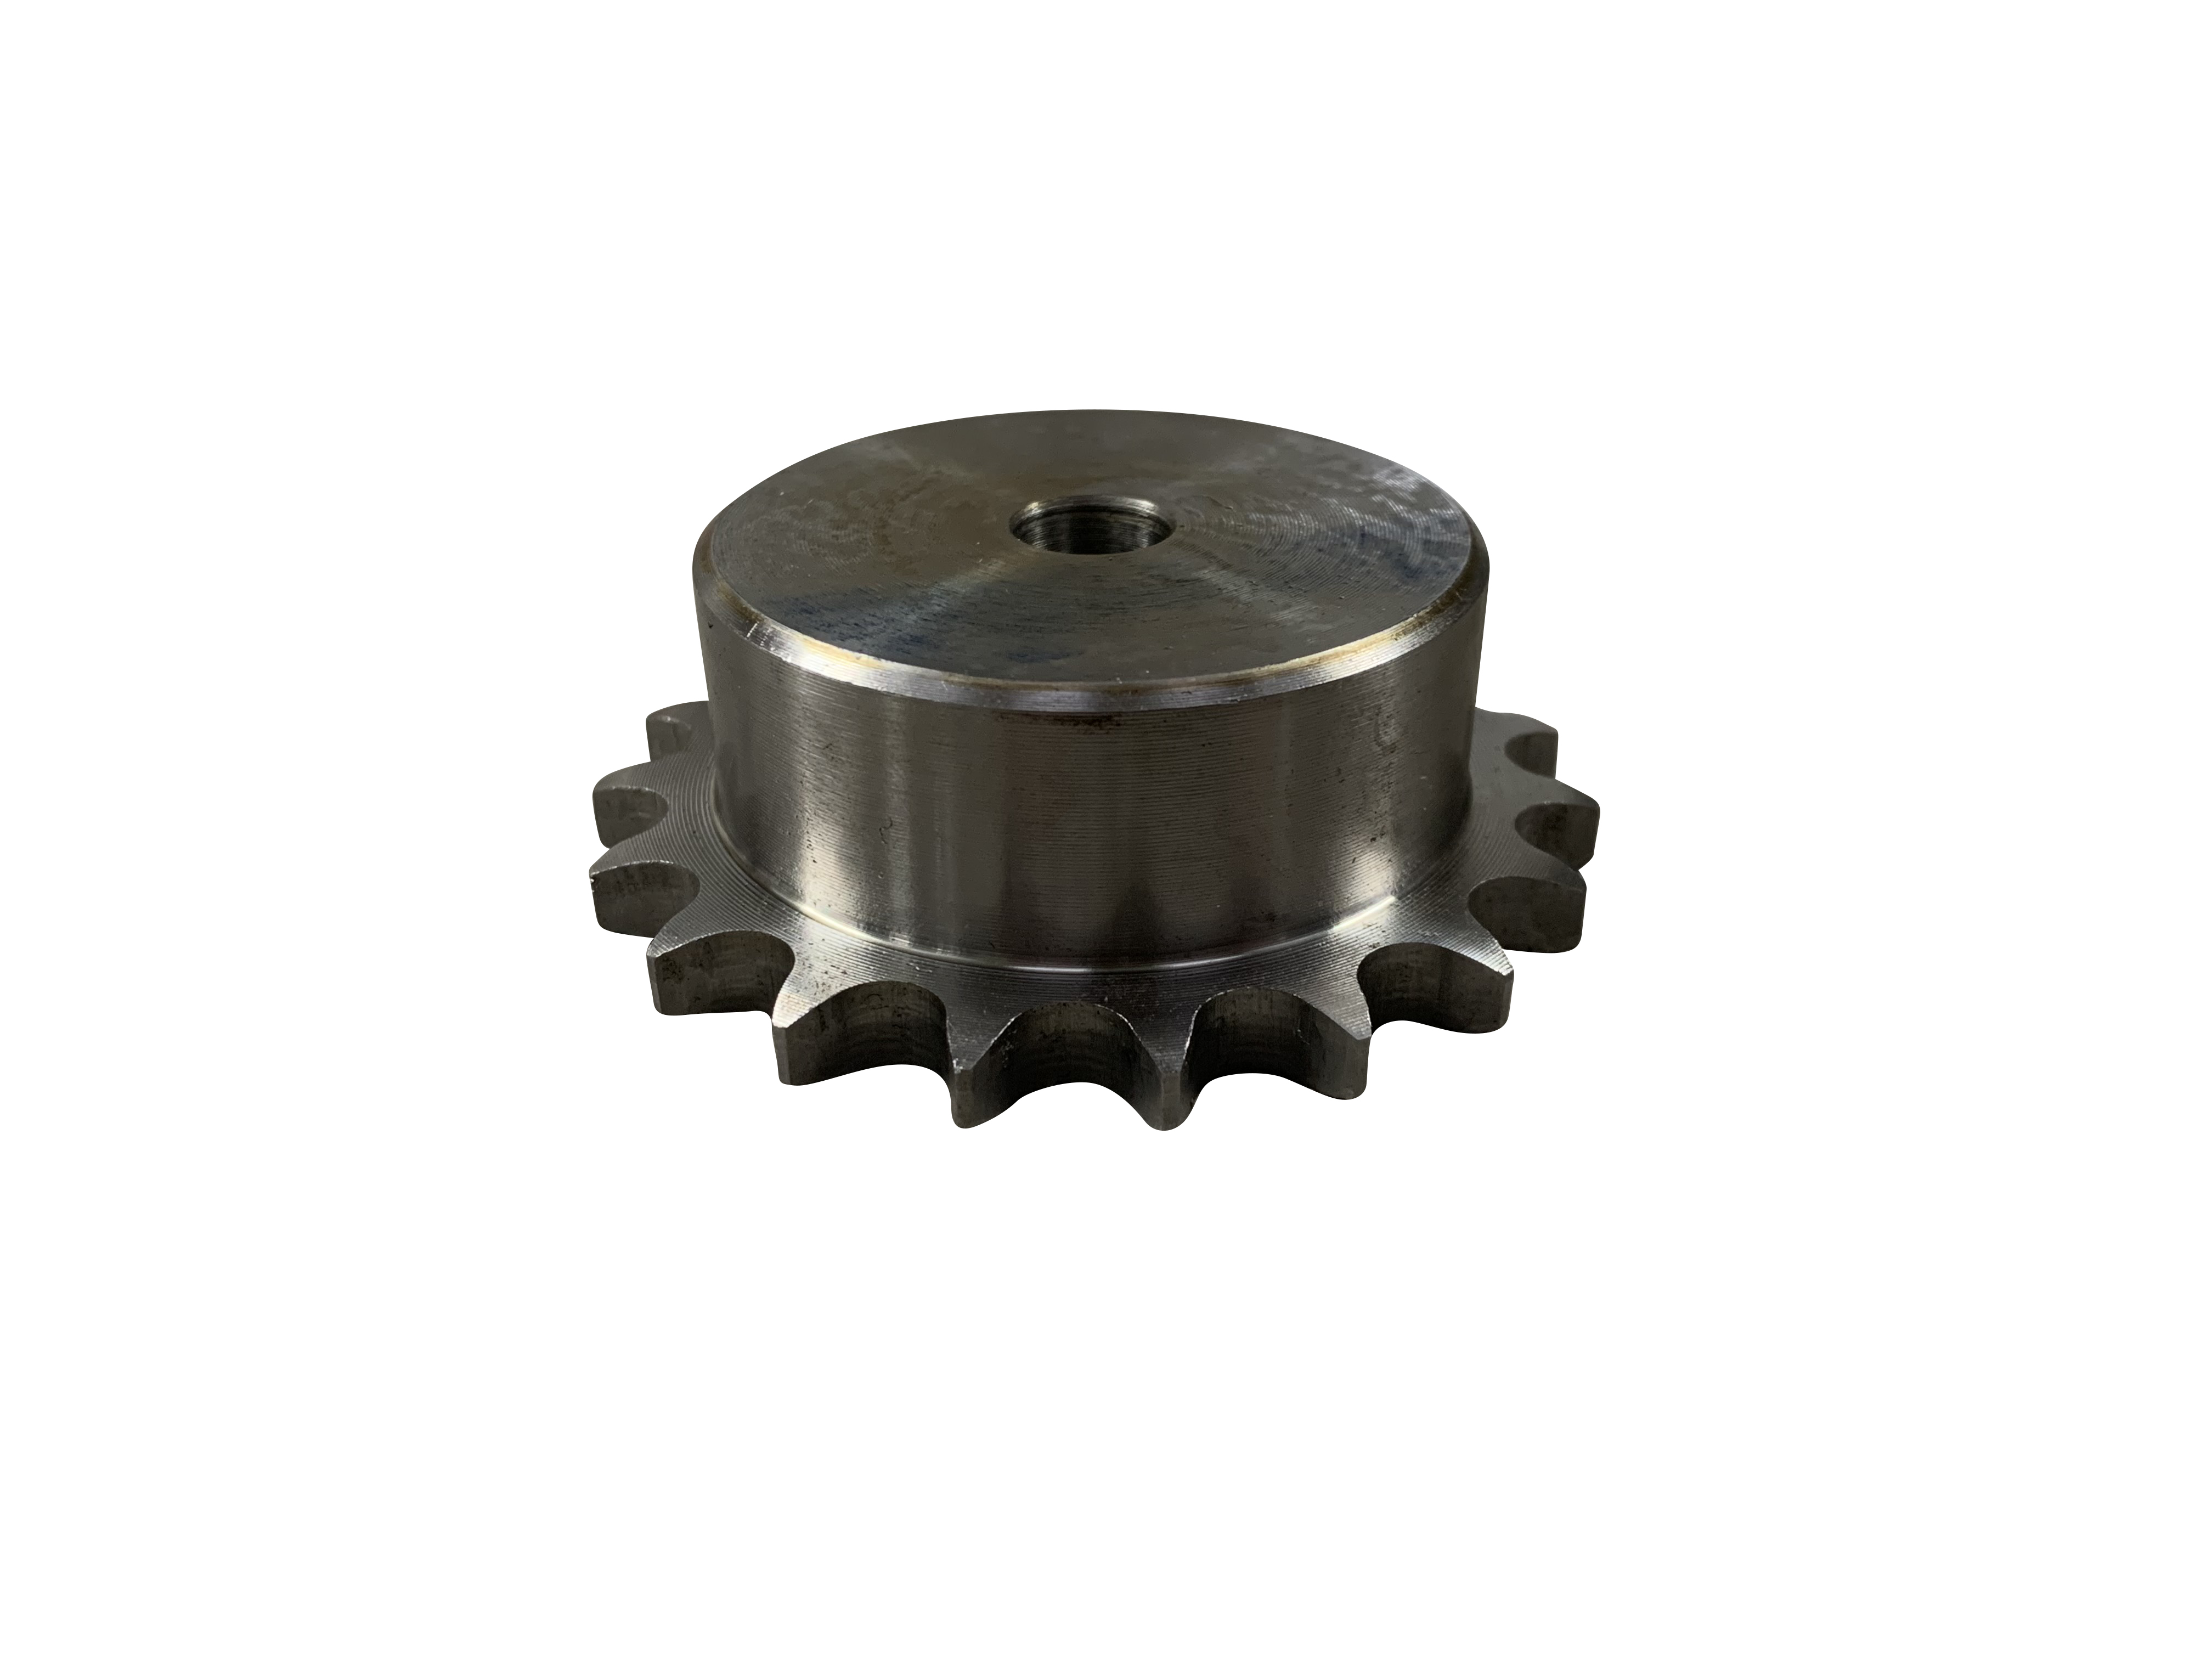 45 Tooth 8mm Steel Roller Chain Simplex Sprocket Pilot Bore 05B-1-45